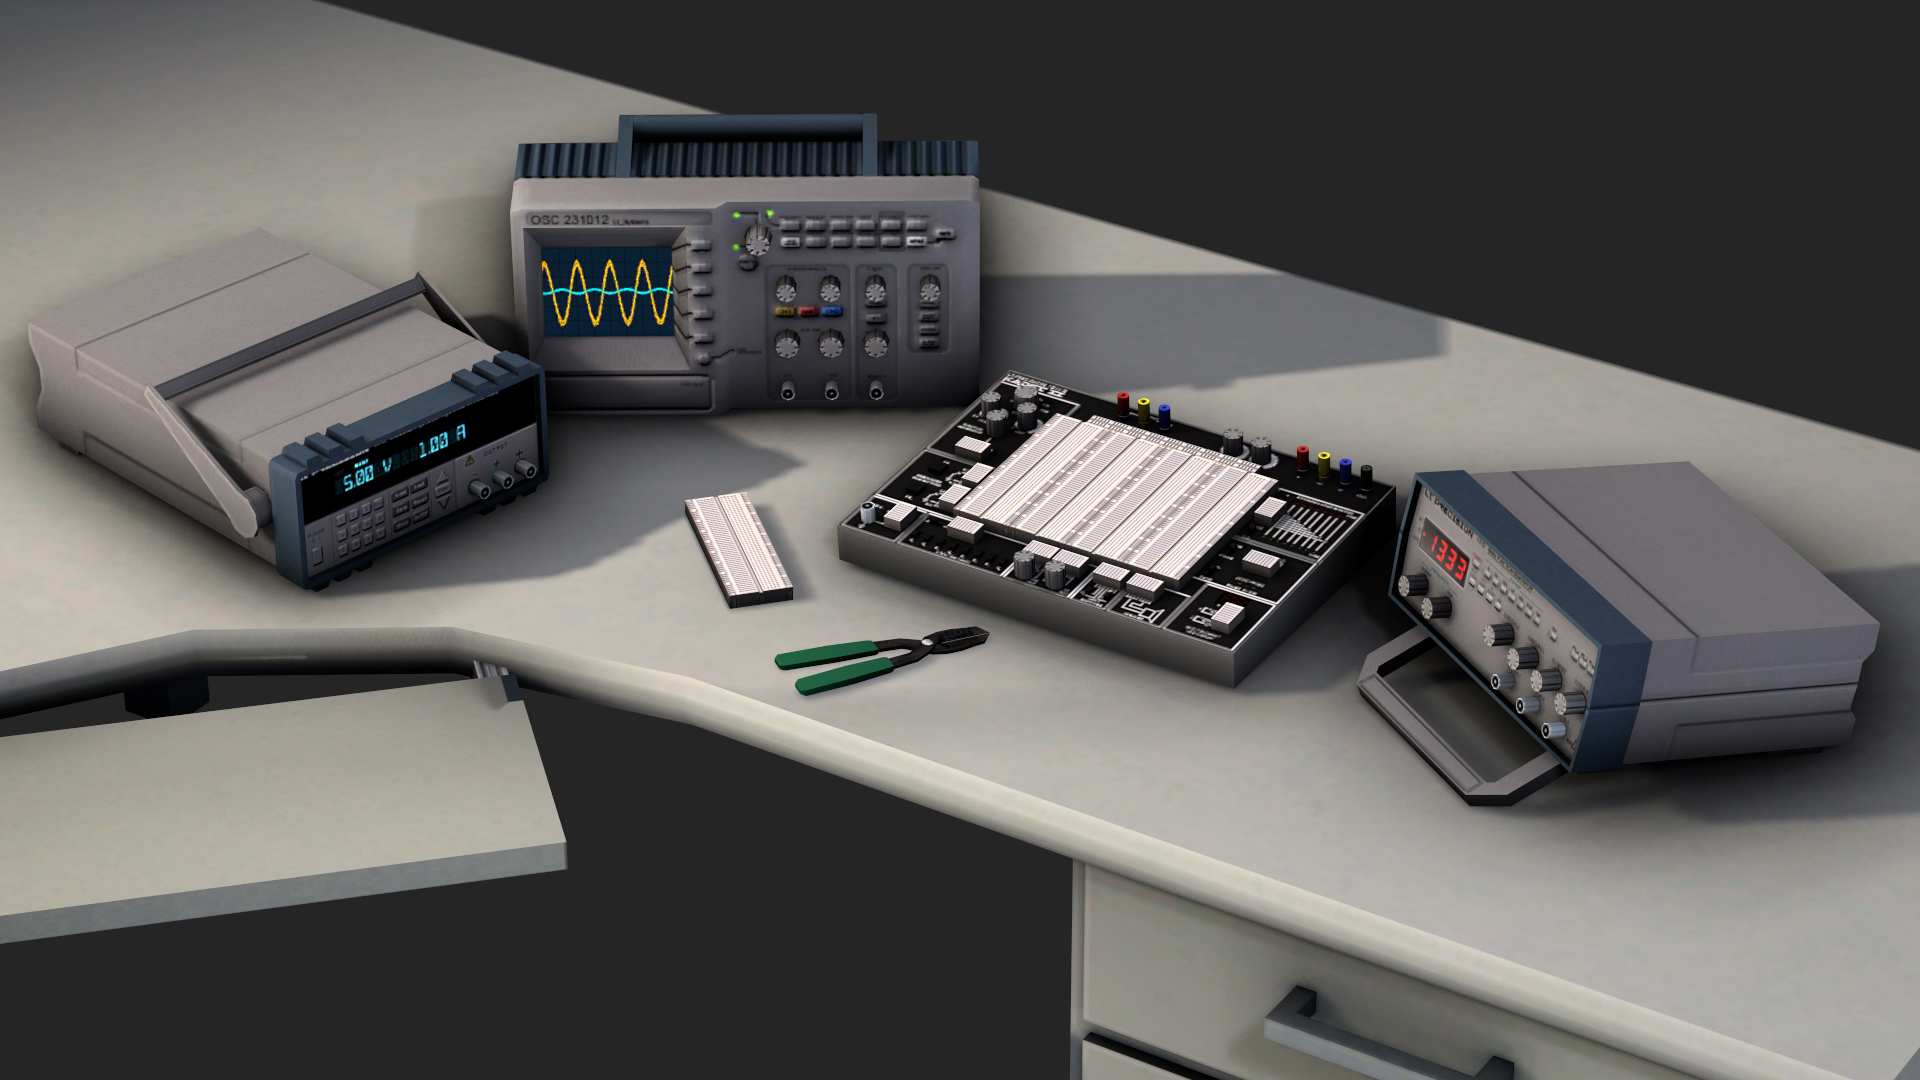 Electronic Lab Instruments : Electronics lab equipment image lt commander mod db